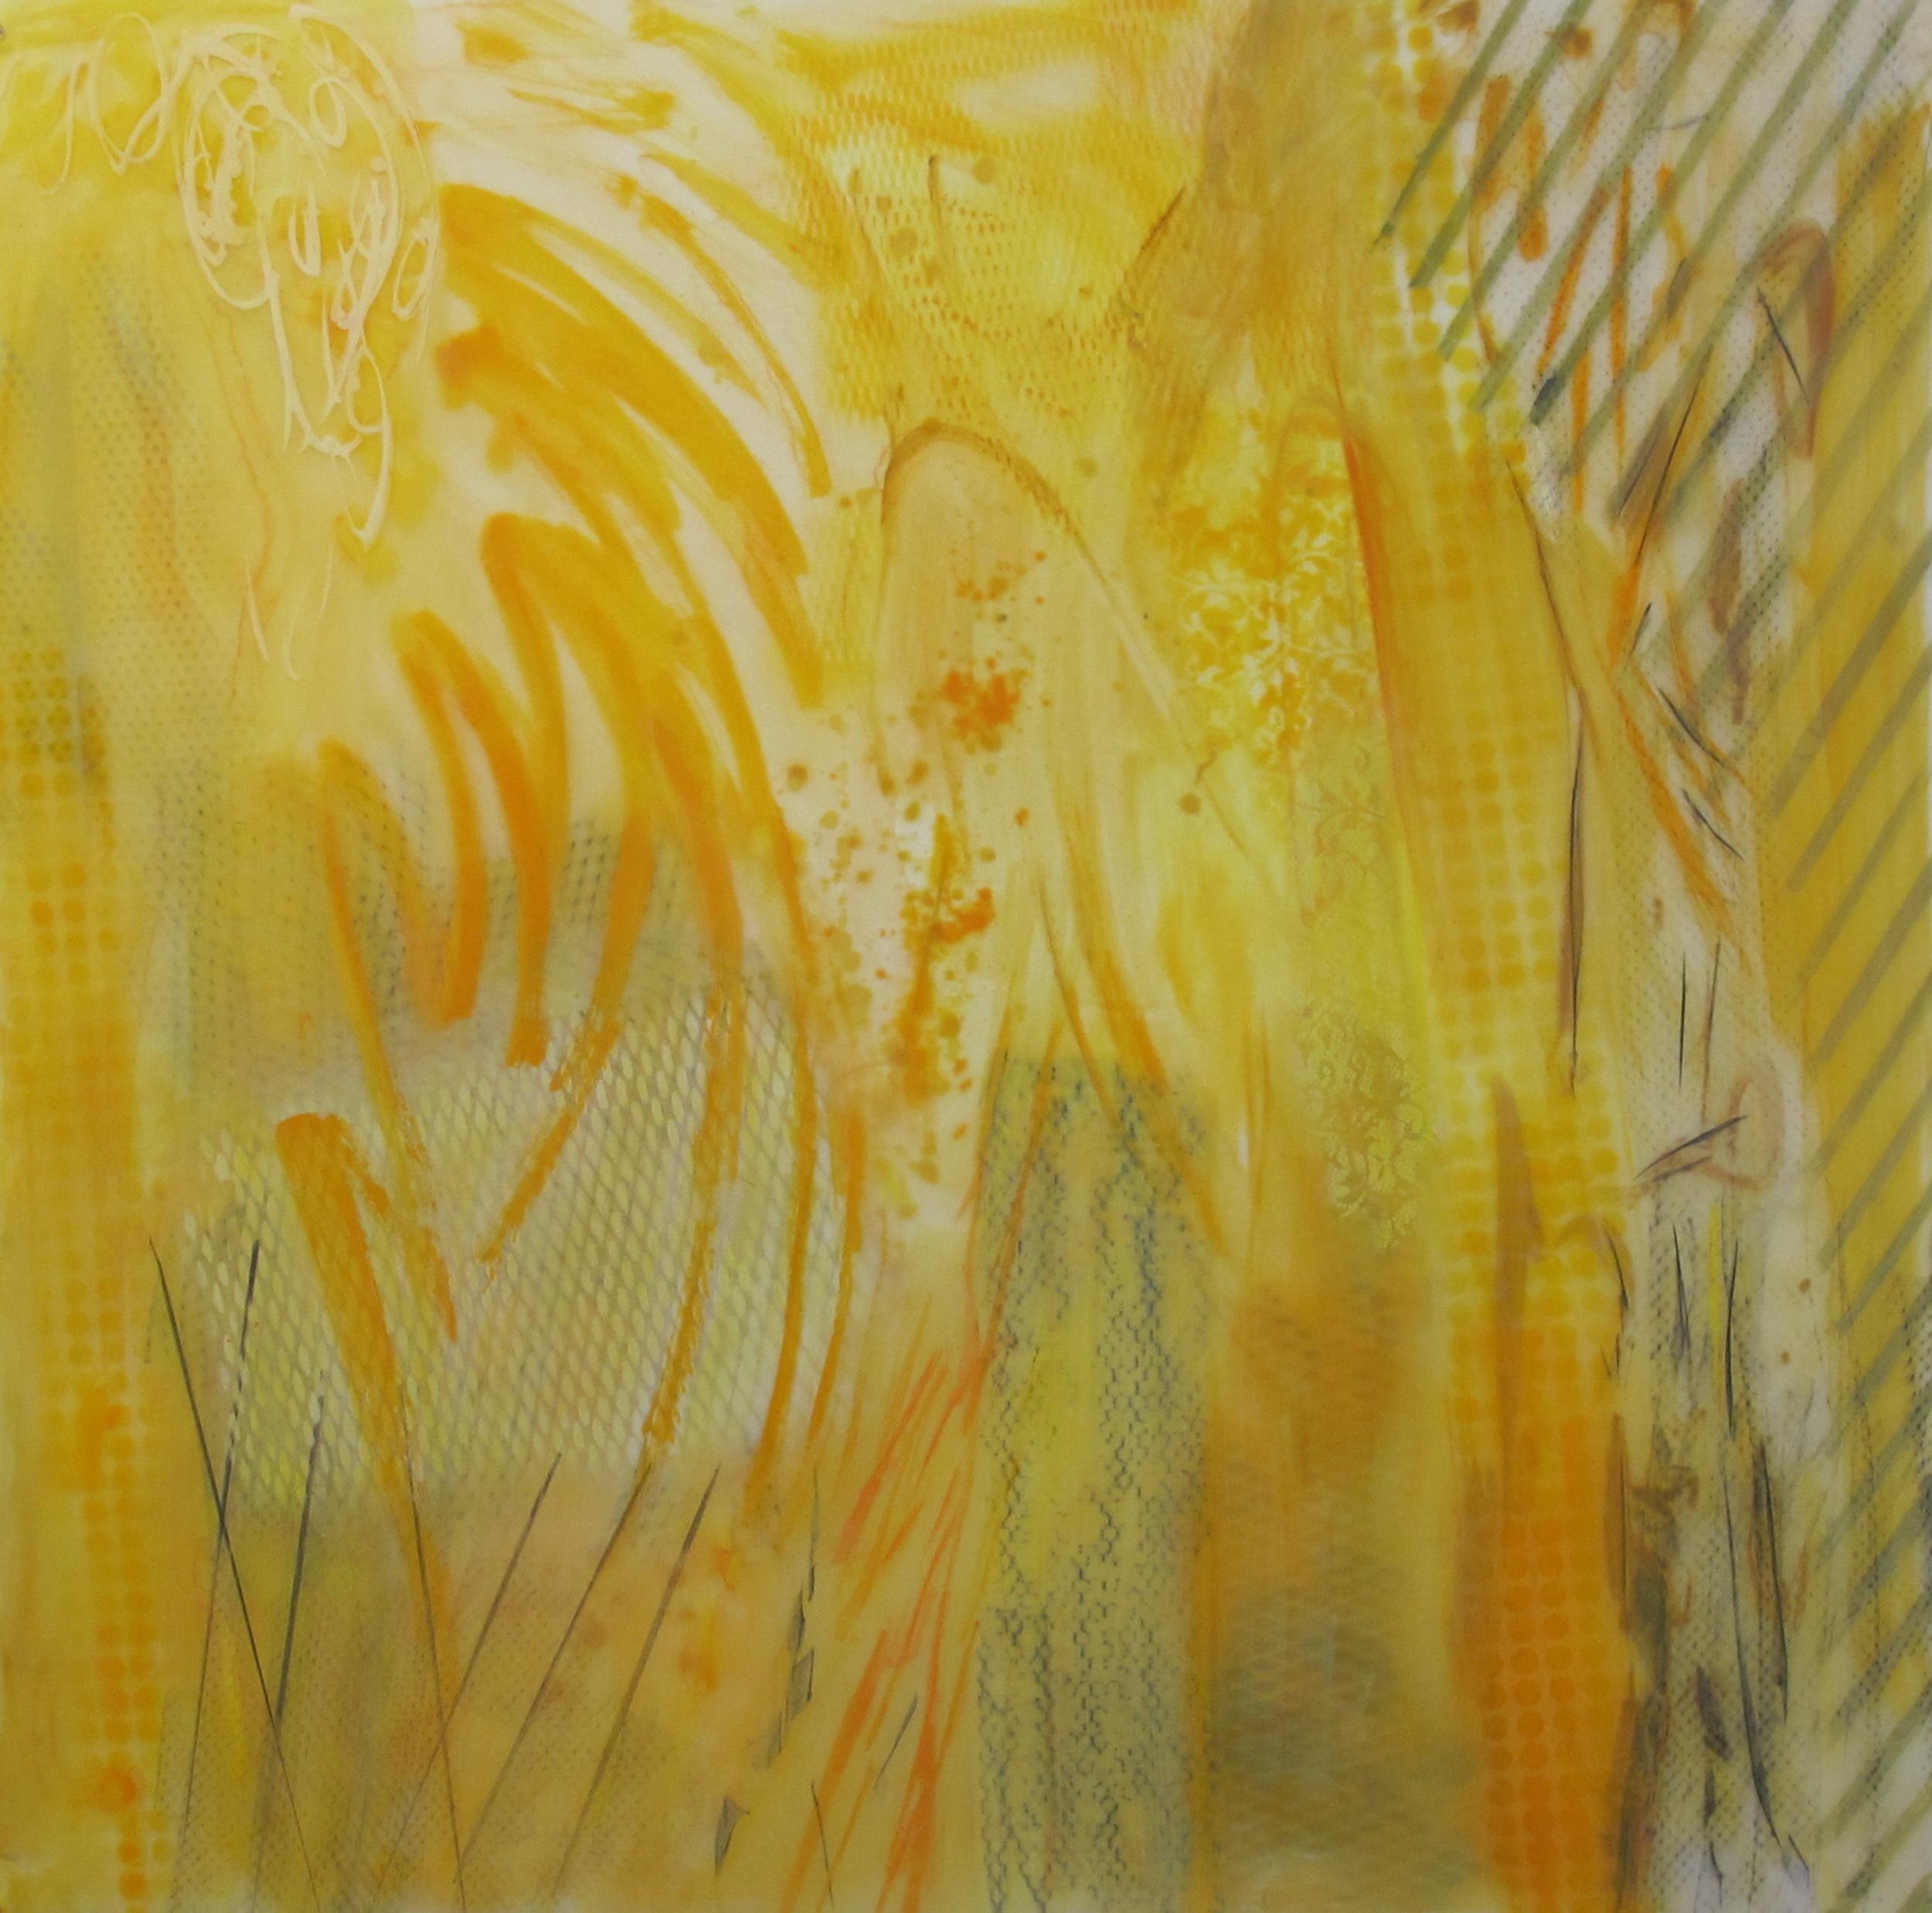 22. Earth Scape 18 Yellow Arranged  oil graphite pastel spray on lexanon plexi 48 x 48 inches.jpg